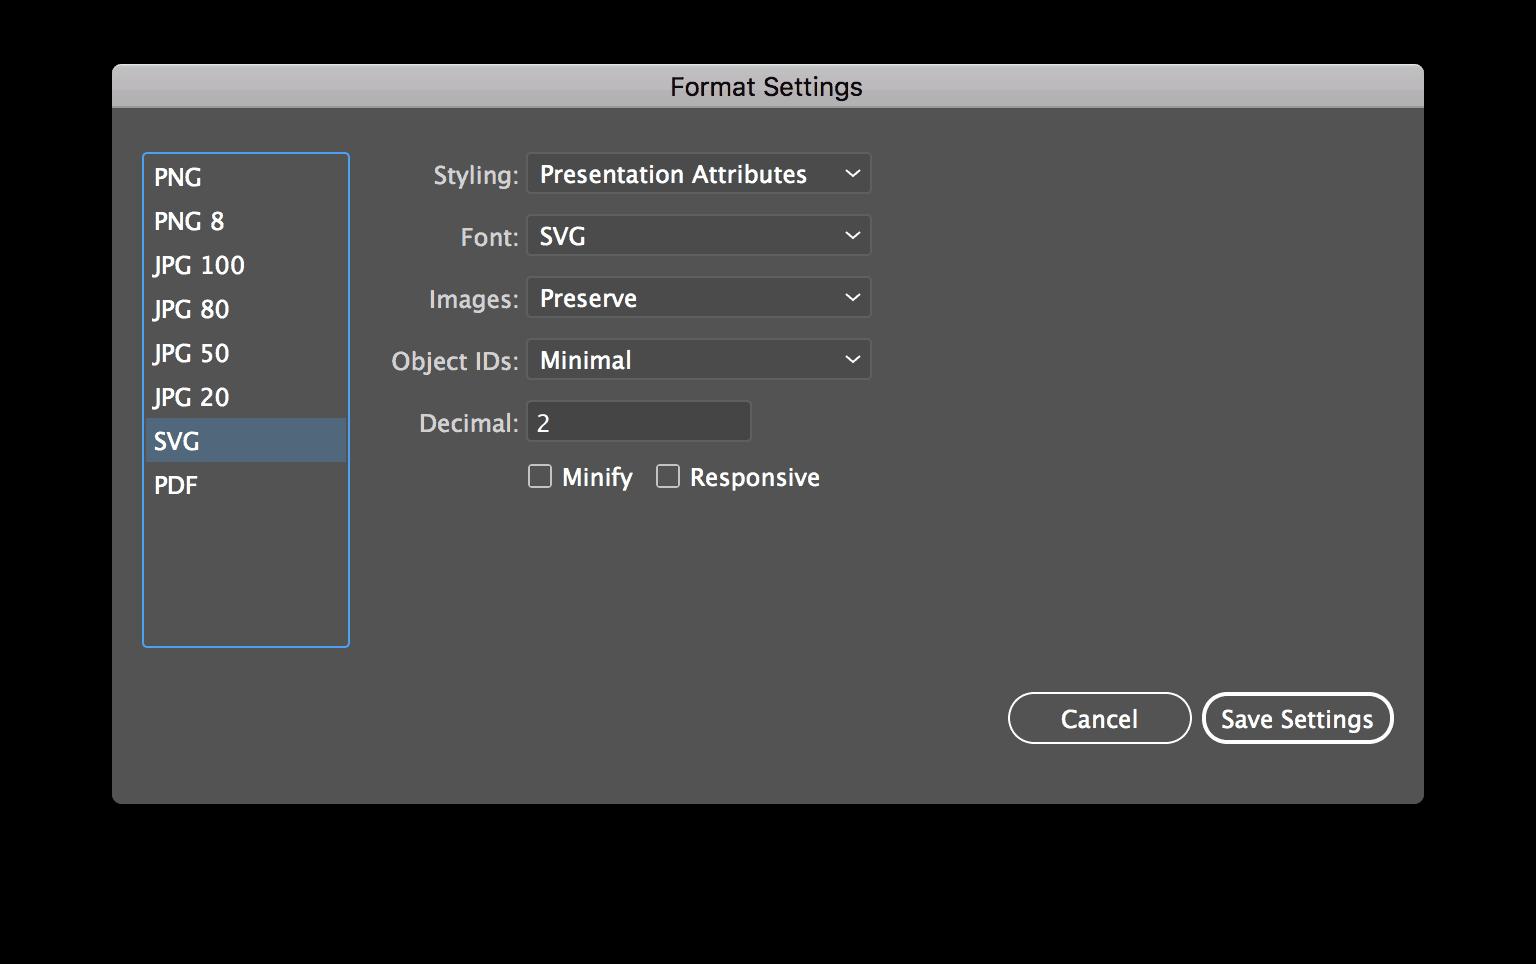 Adobe Illustrator - Format Settings